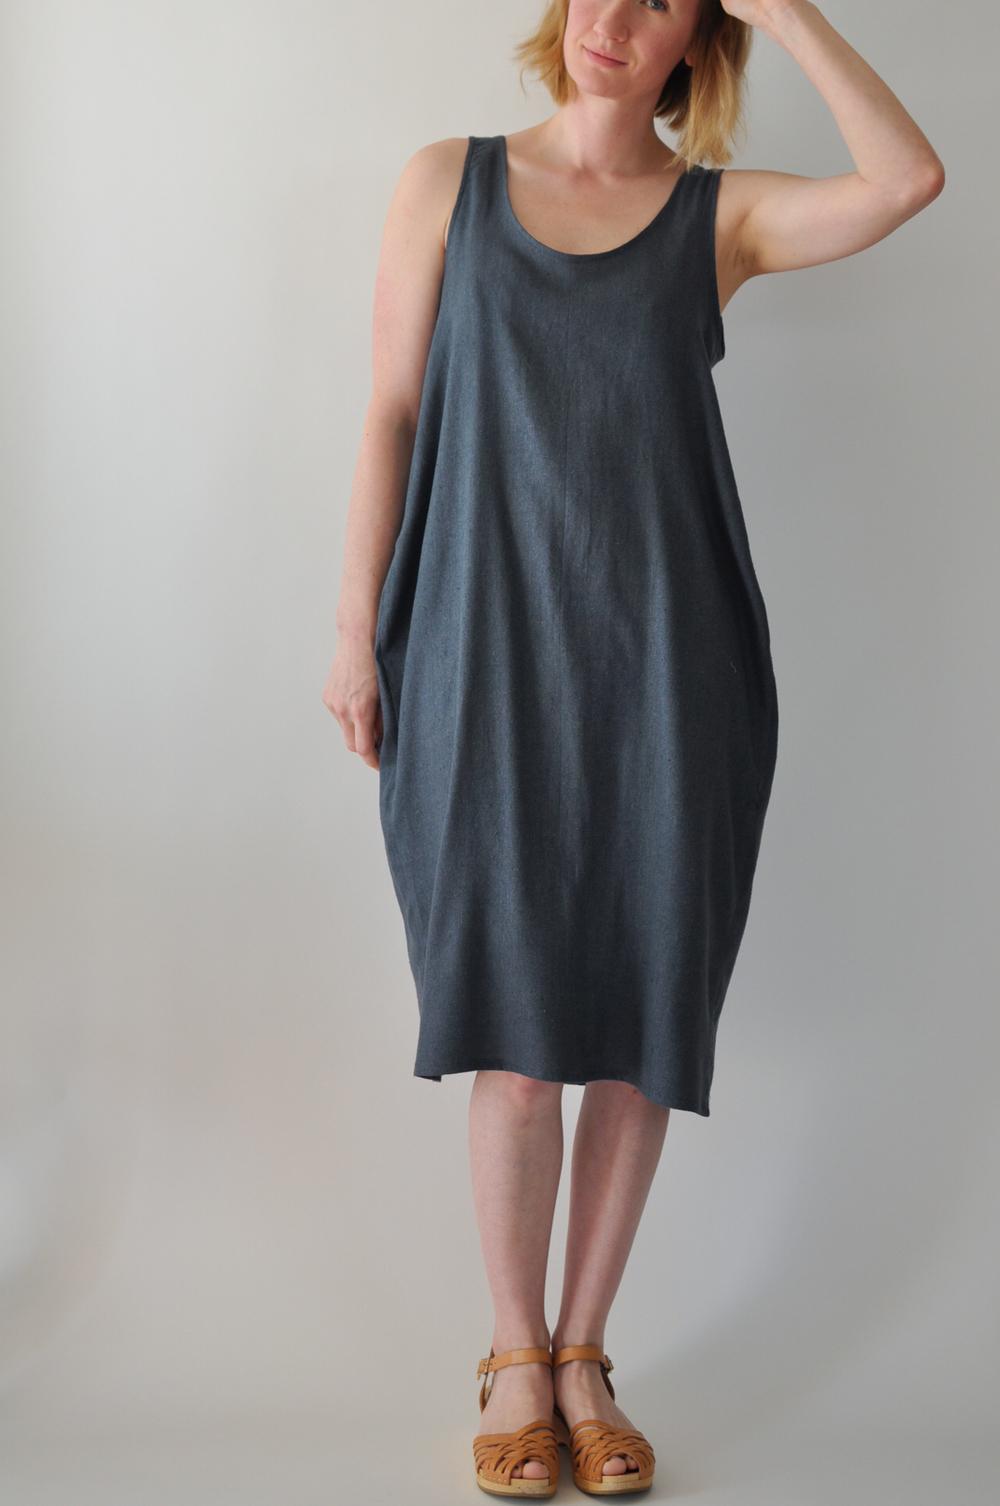 DIY Cocoon Dress